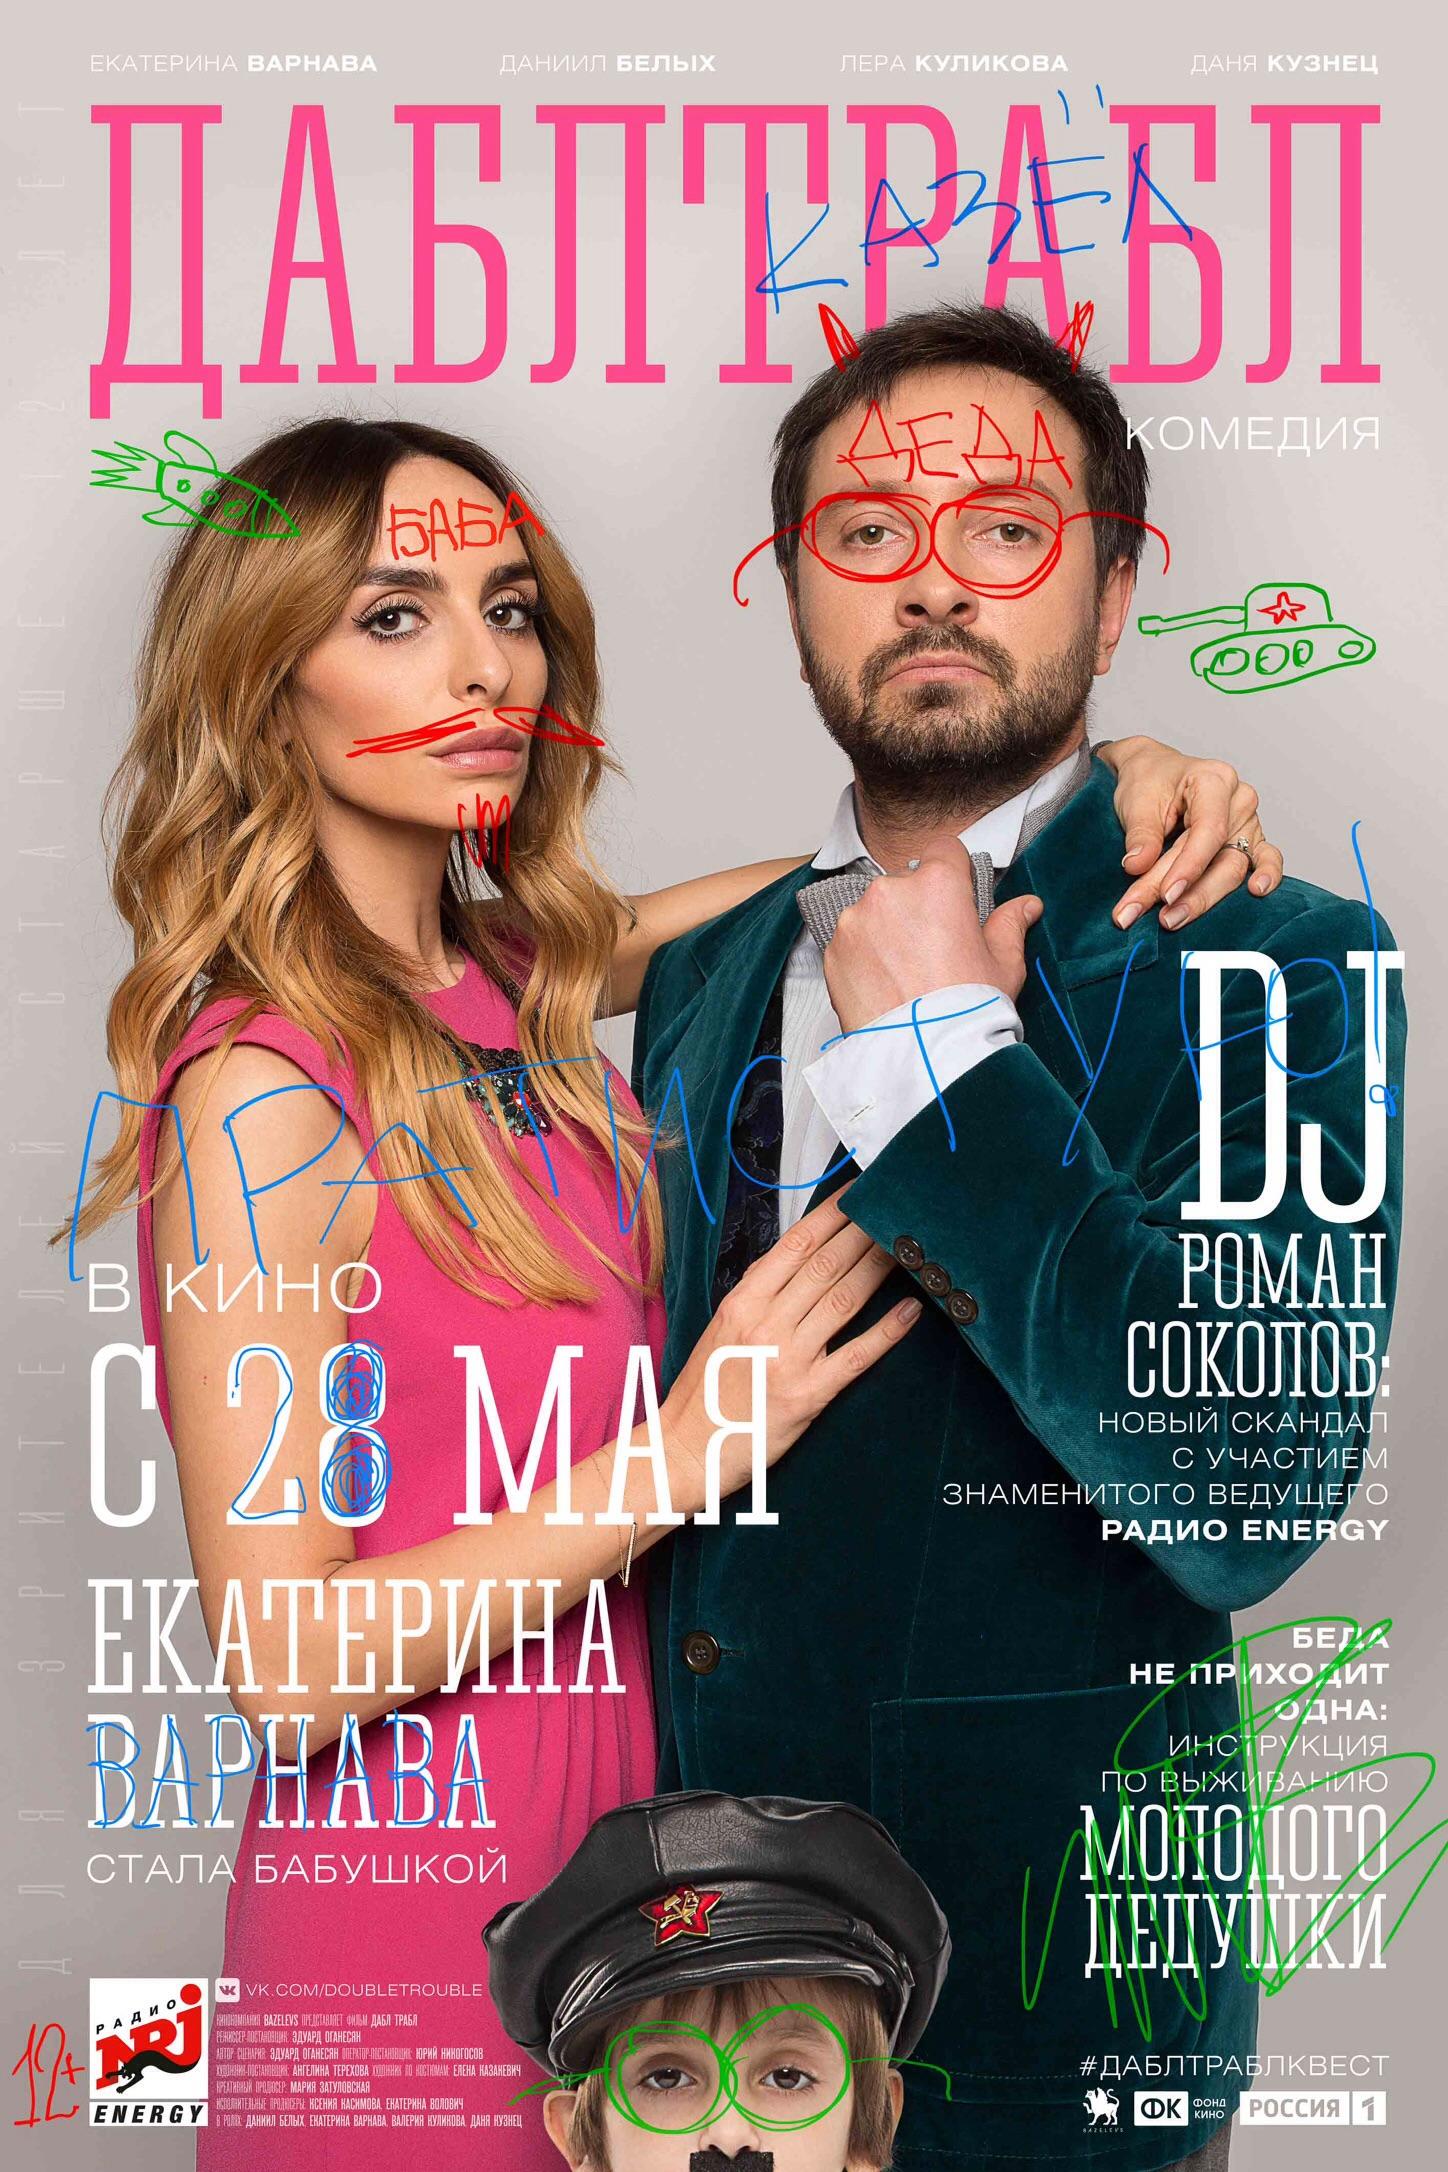 Domogarov told about his own wedding 08/03/2011 75